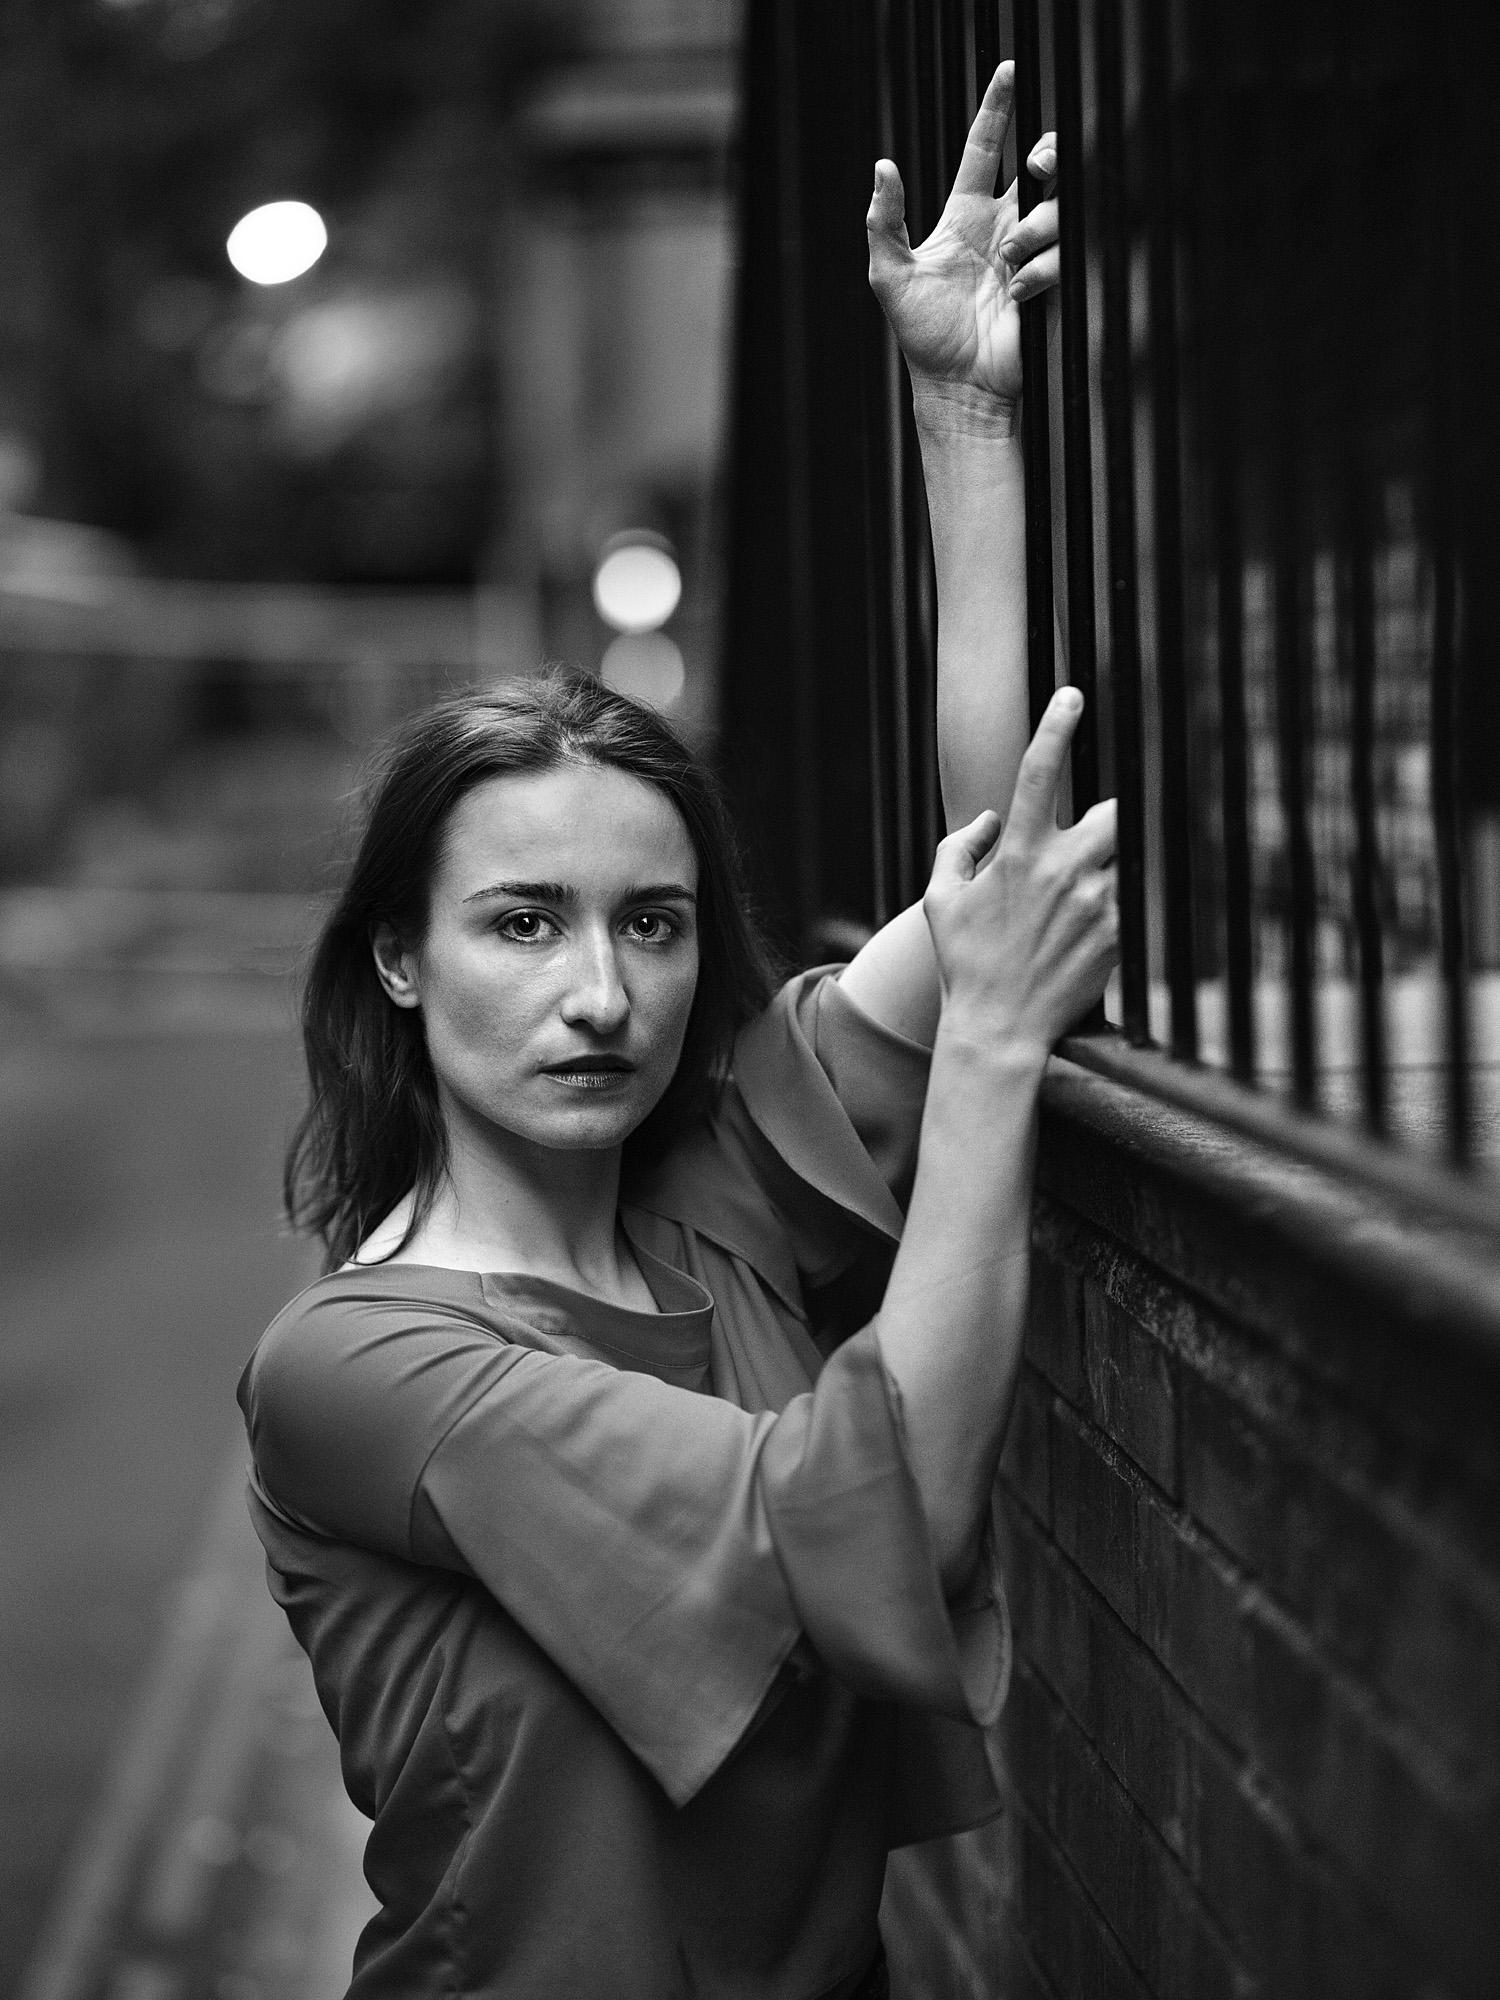 Eliza Țuțurman, © Rino Pucci